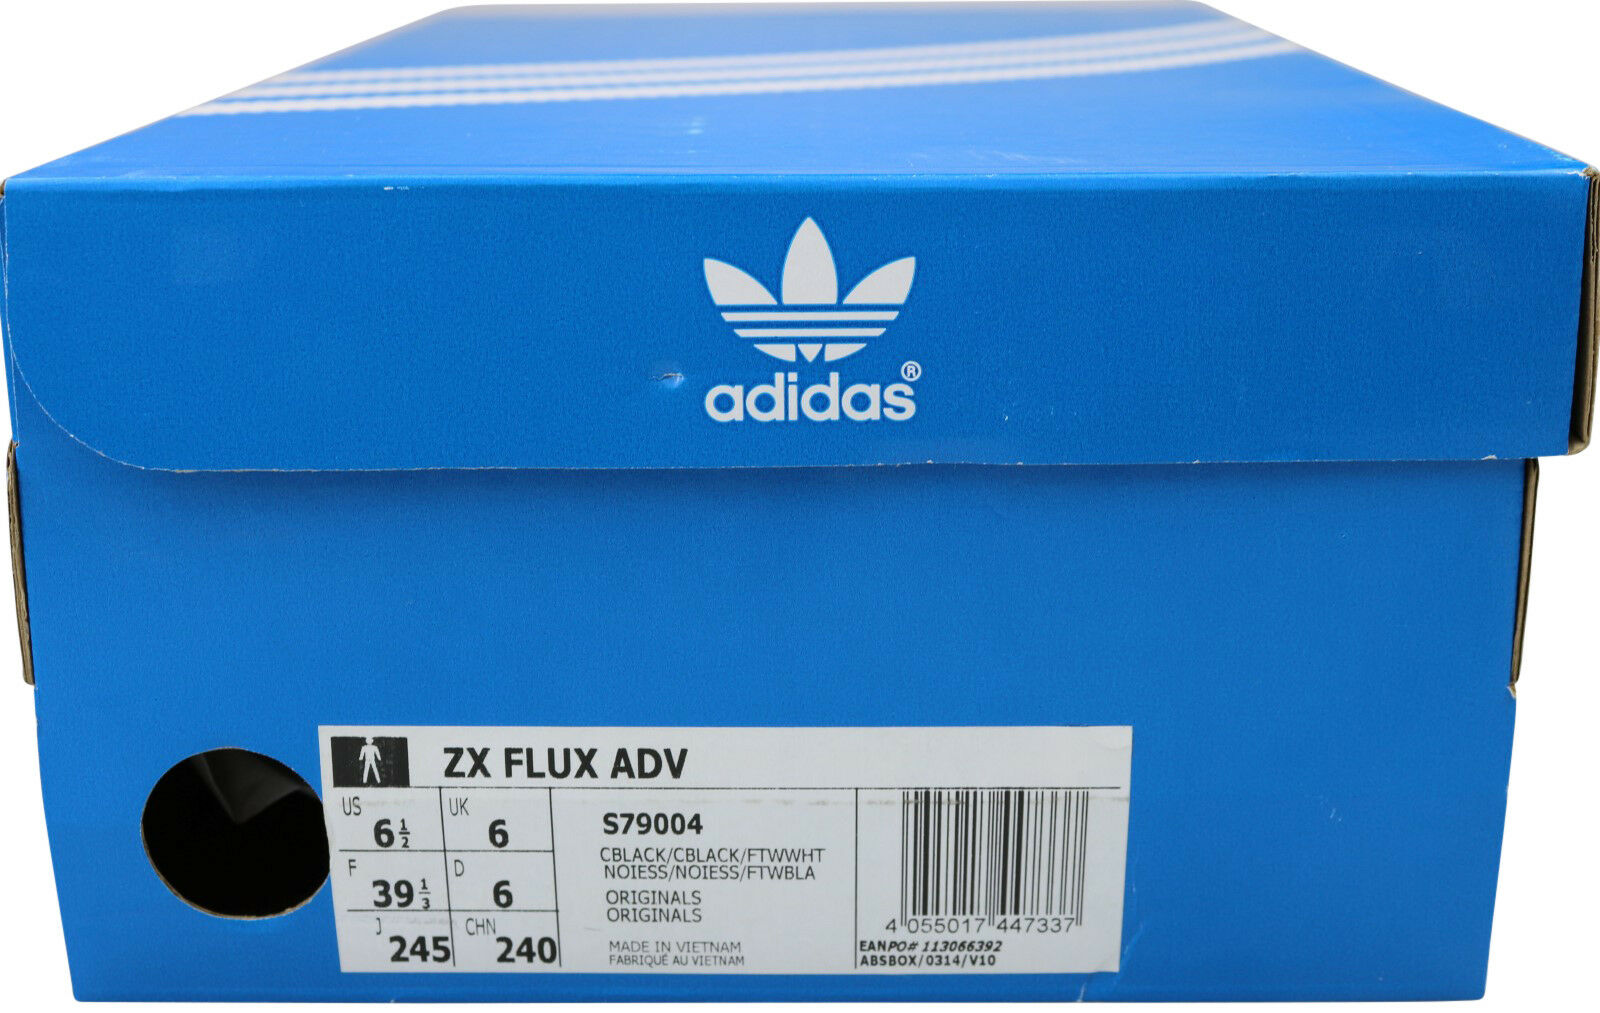 Adidas Adidas Adidas Originals ZX Flux ADV Racer Sneaker Chaussures s79004 taille 39 & 47 NOUVEAU & NEUF dans sa bo?te | Stocker  deaff8